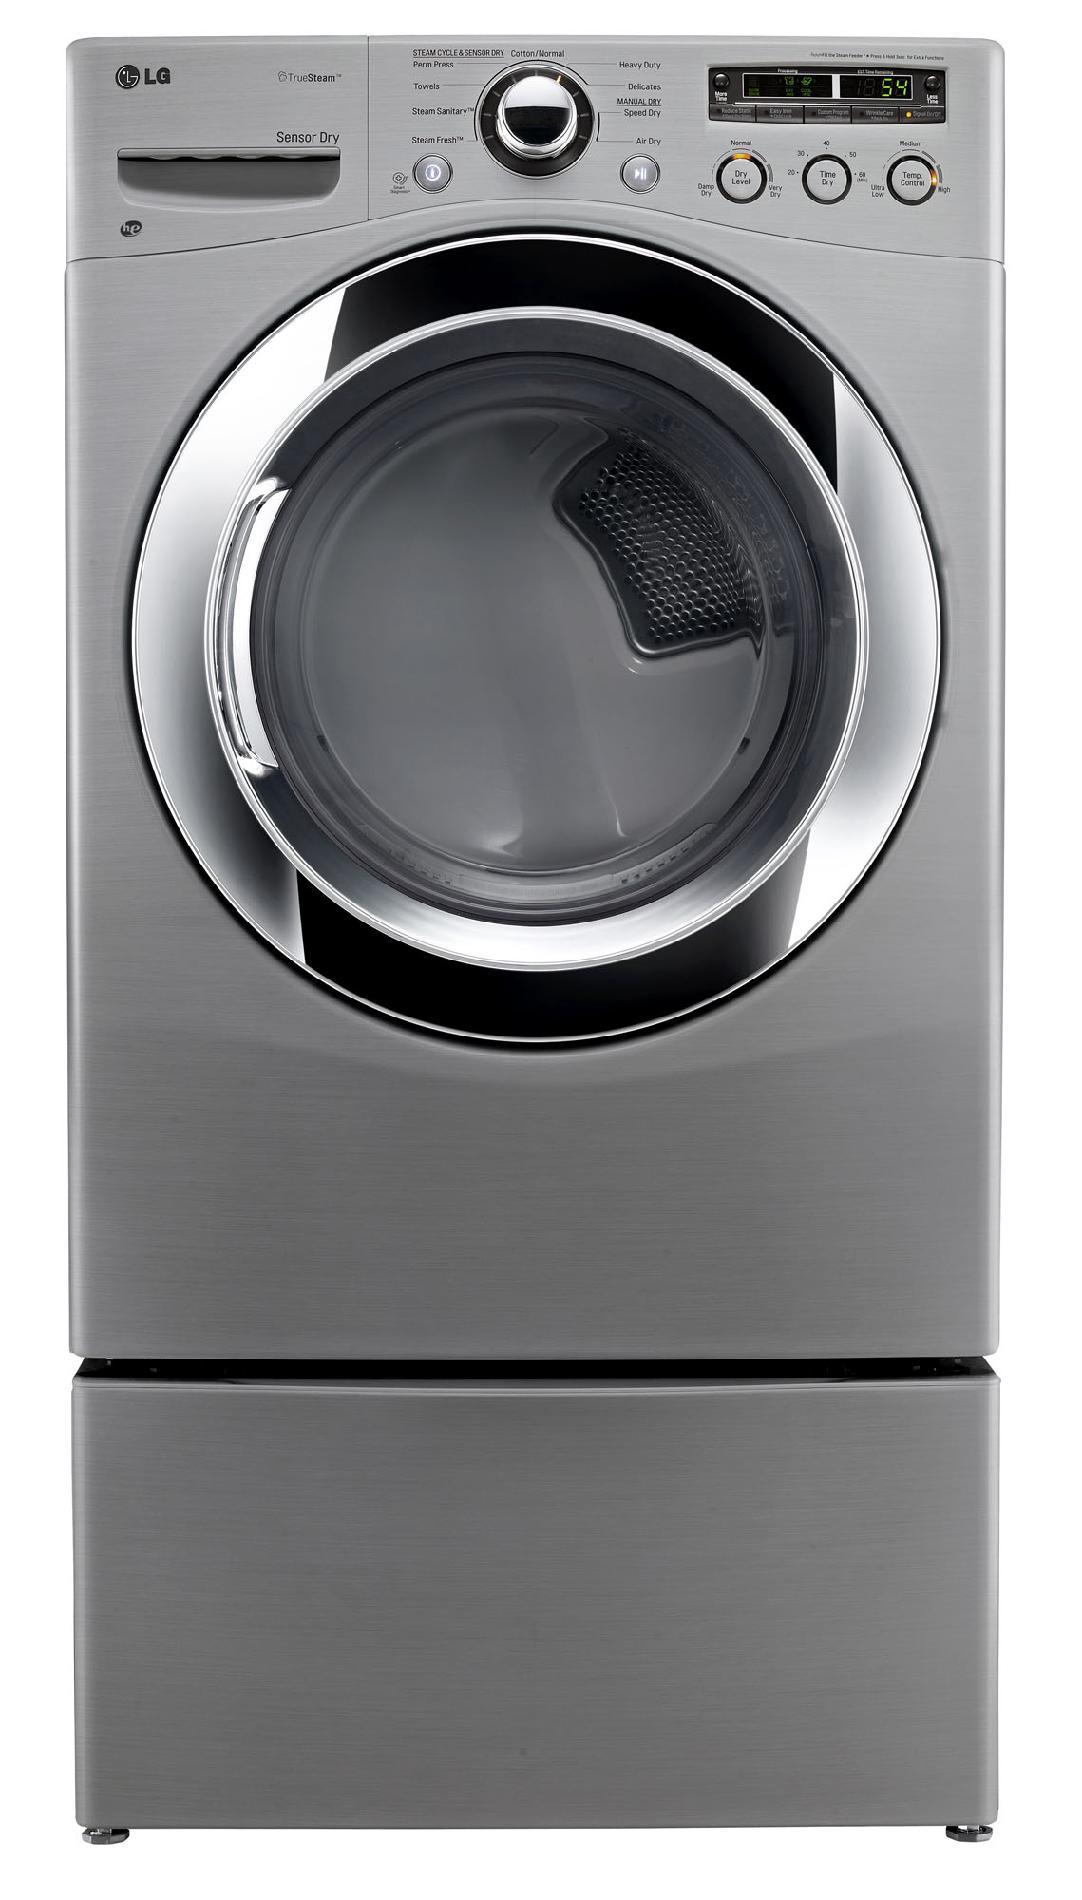 LG 7.3 cu. ft. Gas Dryer w/ Sensor Dry - Graphite Steel